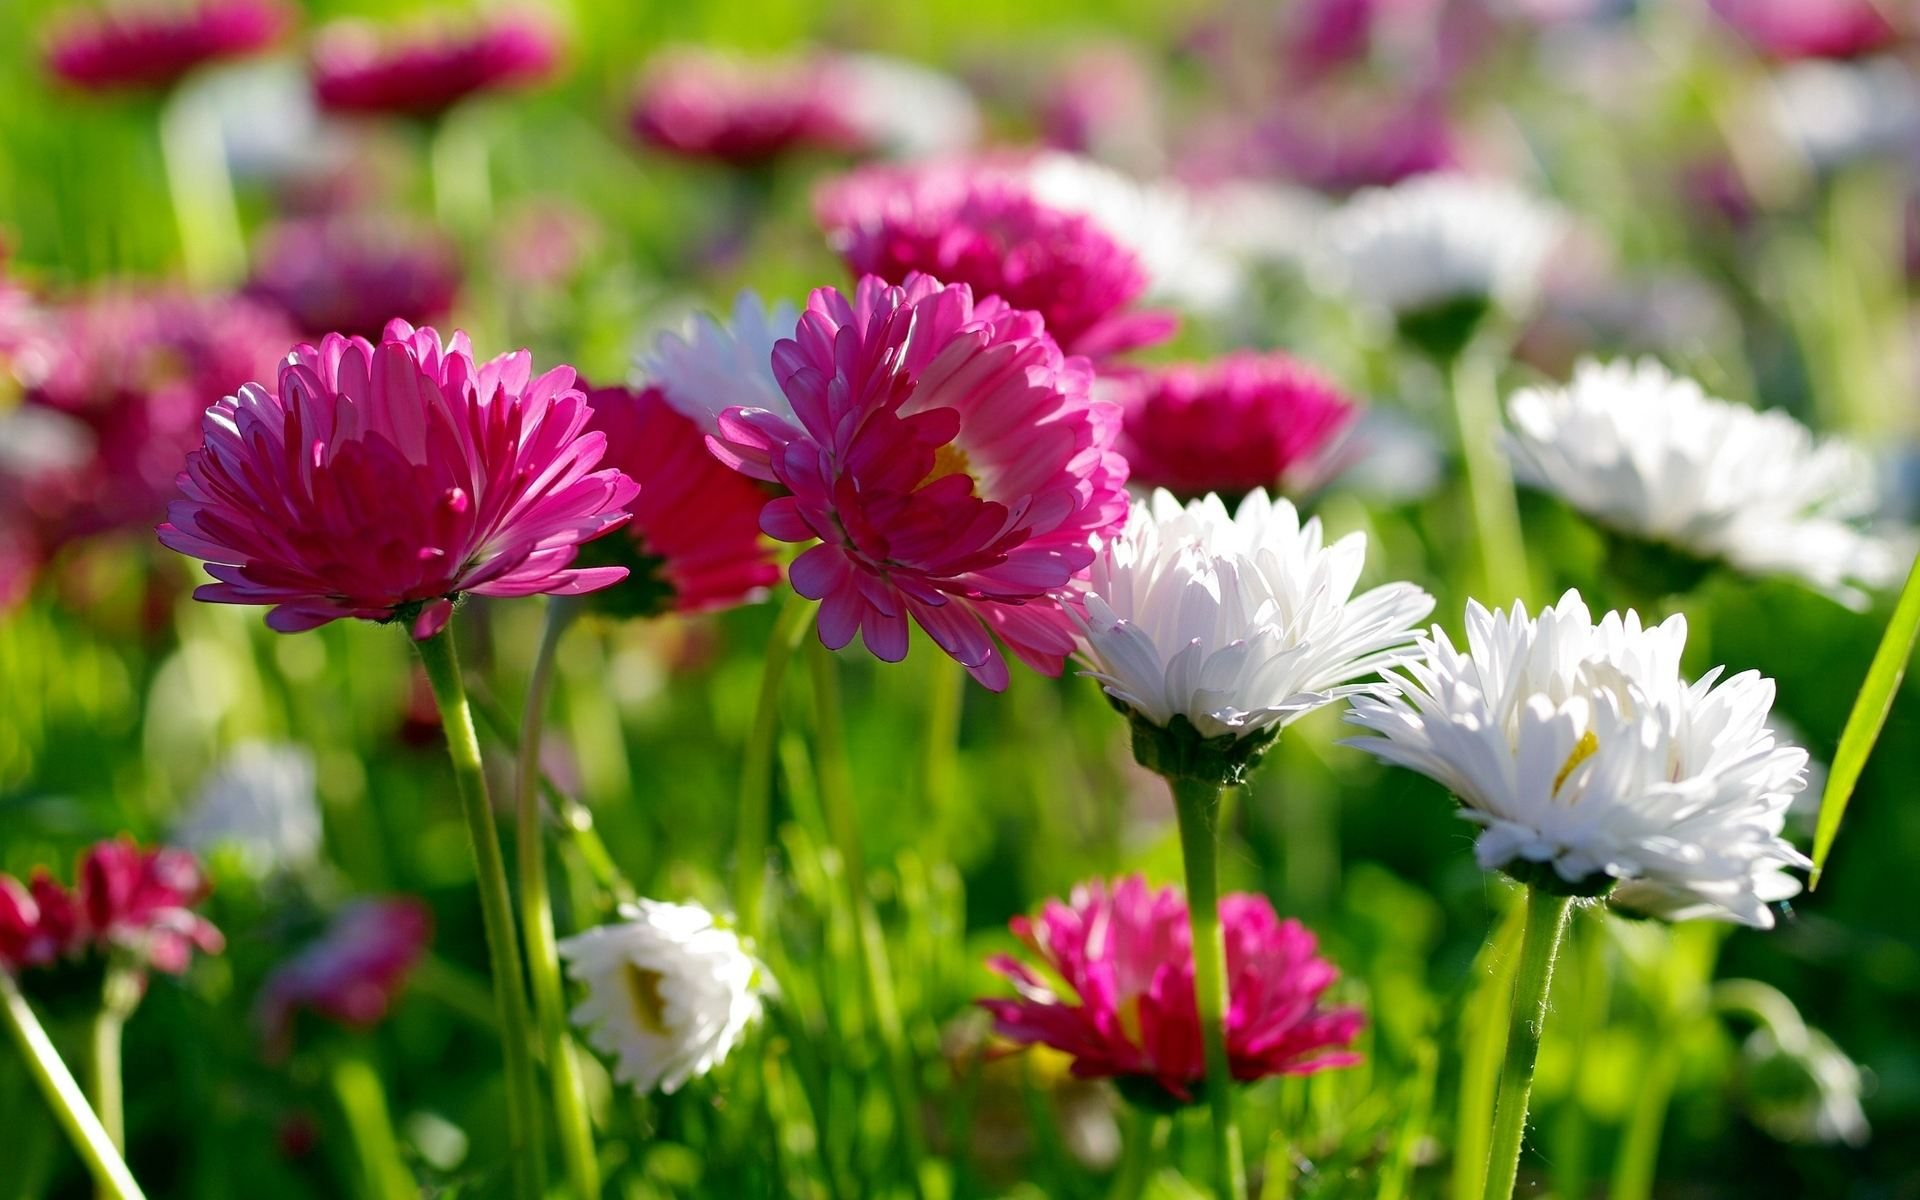 Chrysanthemum Flower Wallpapers